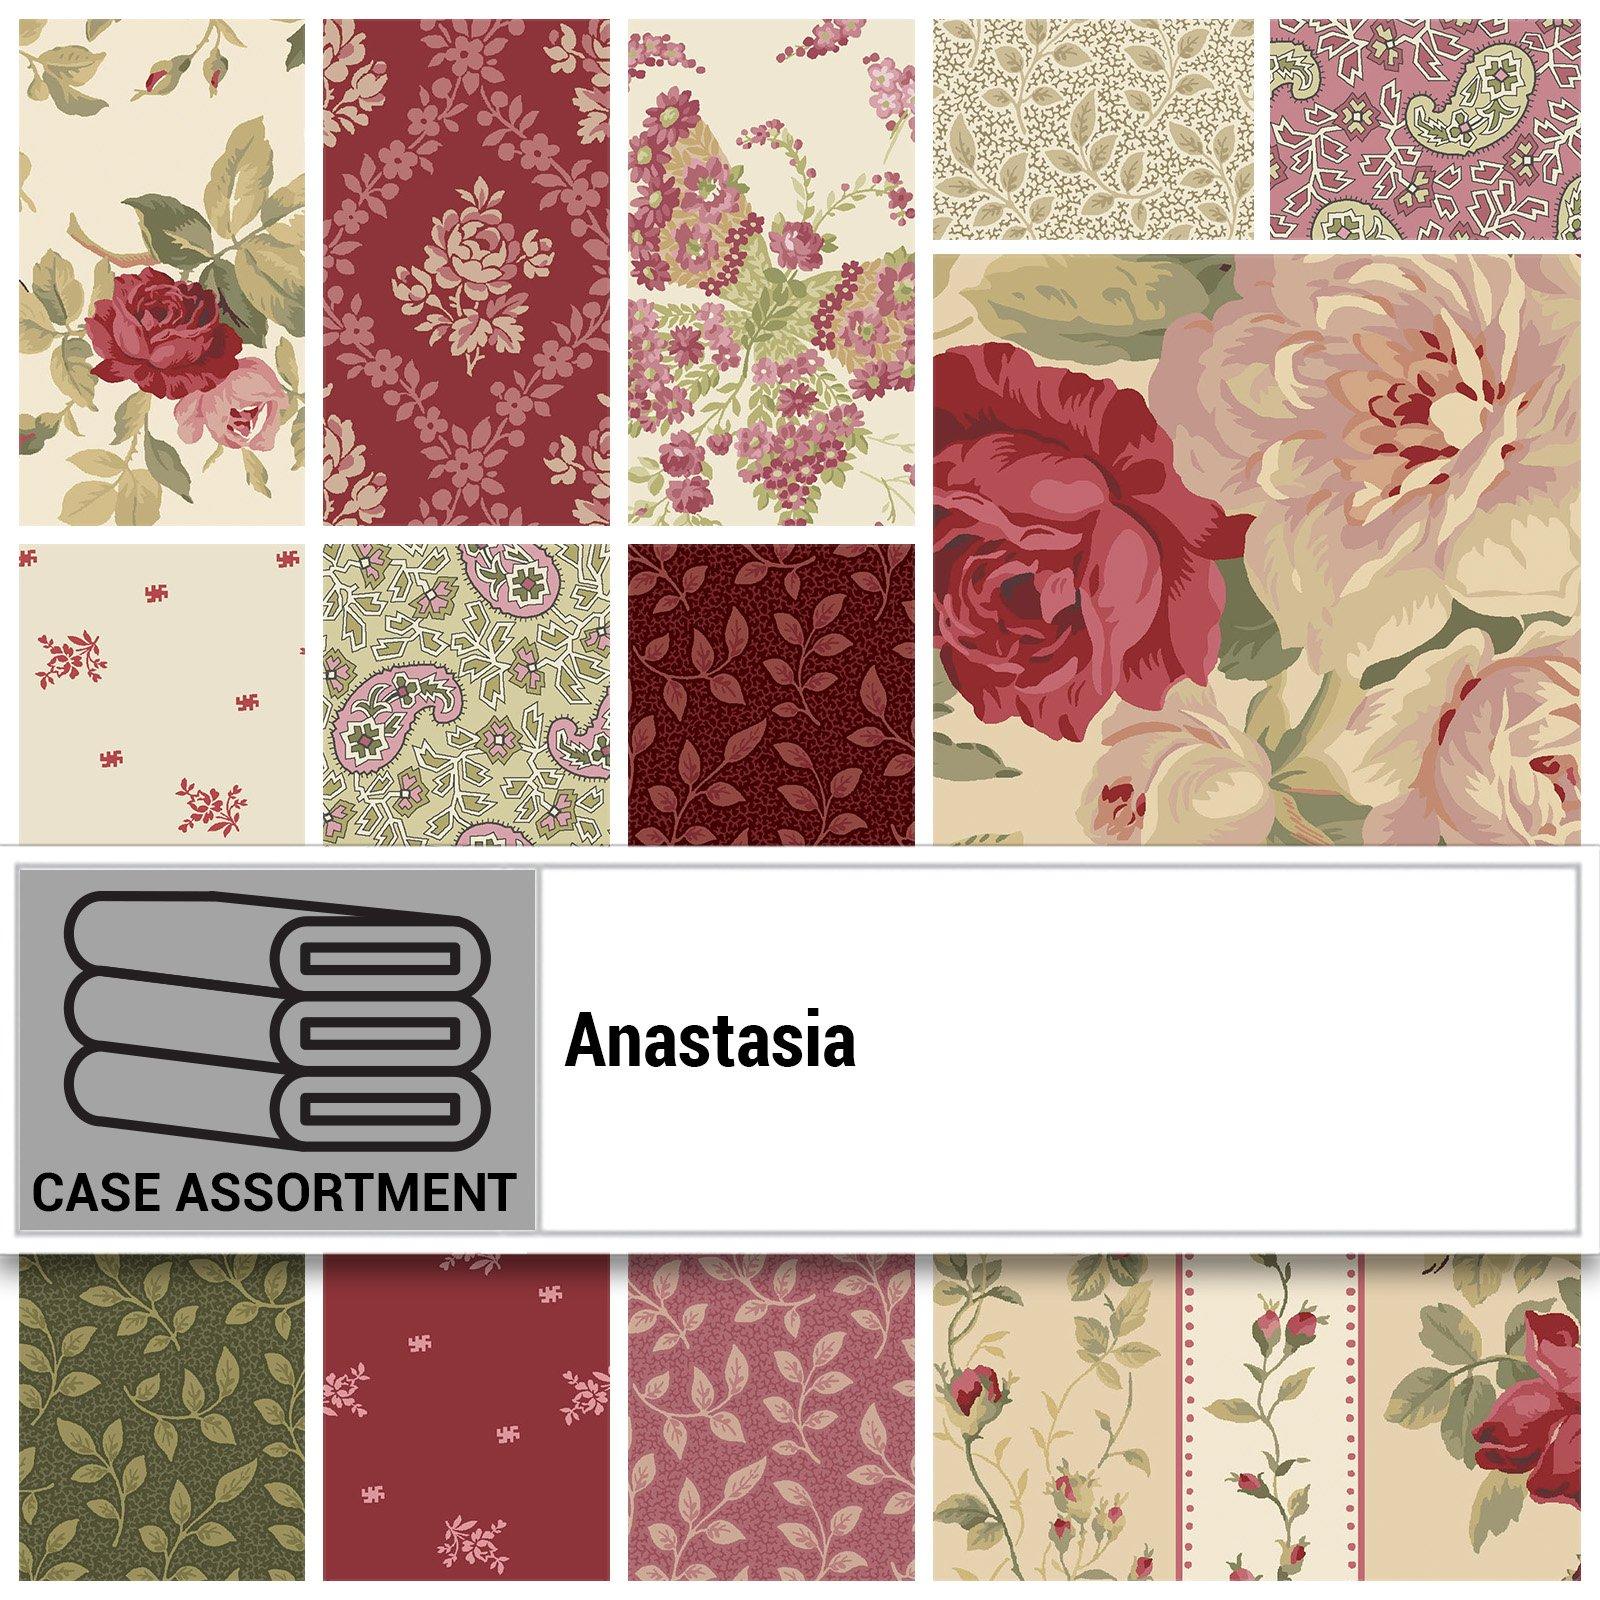 CSMD-CPHB ANAS - ANASTASIA - RED CASE PACK HALF BOLT X 15PCS